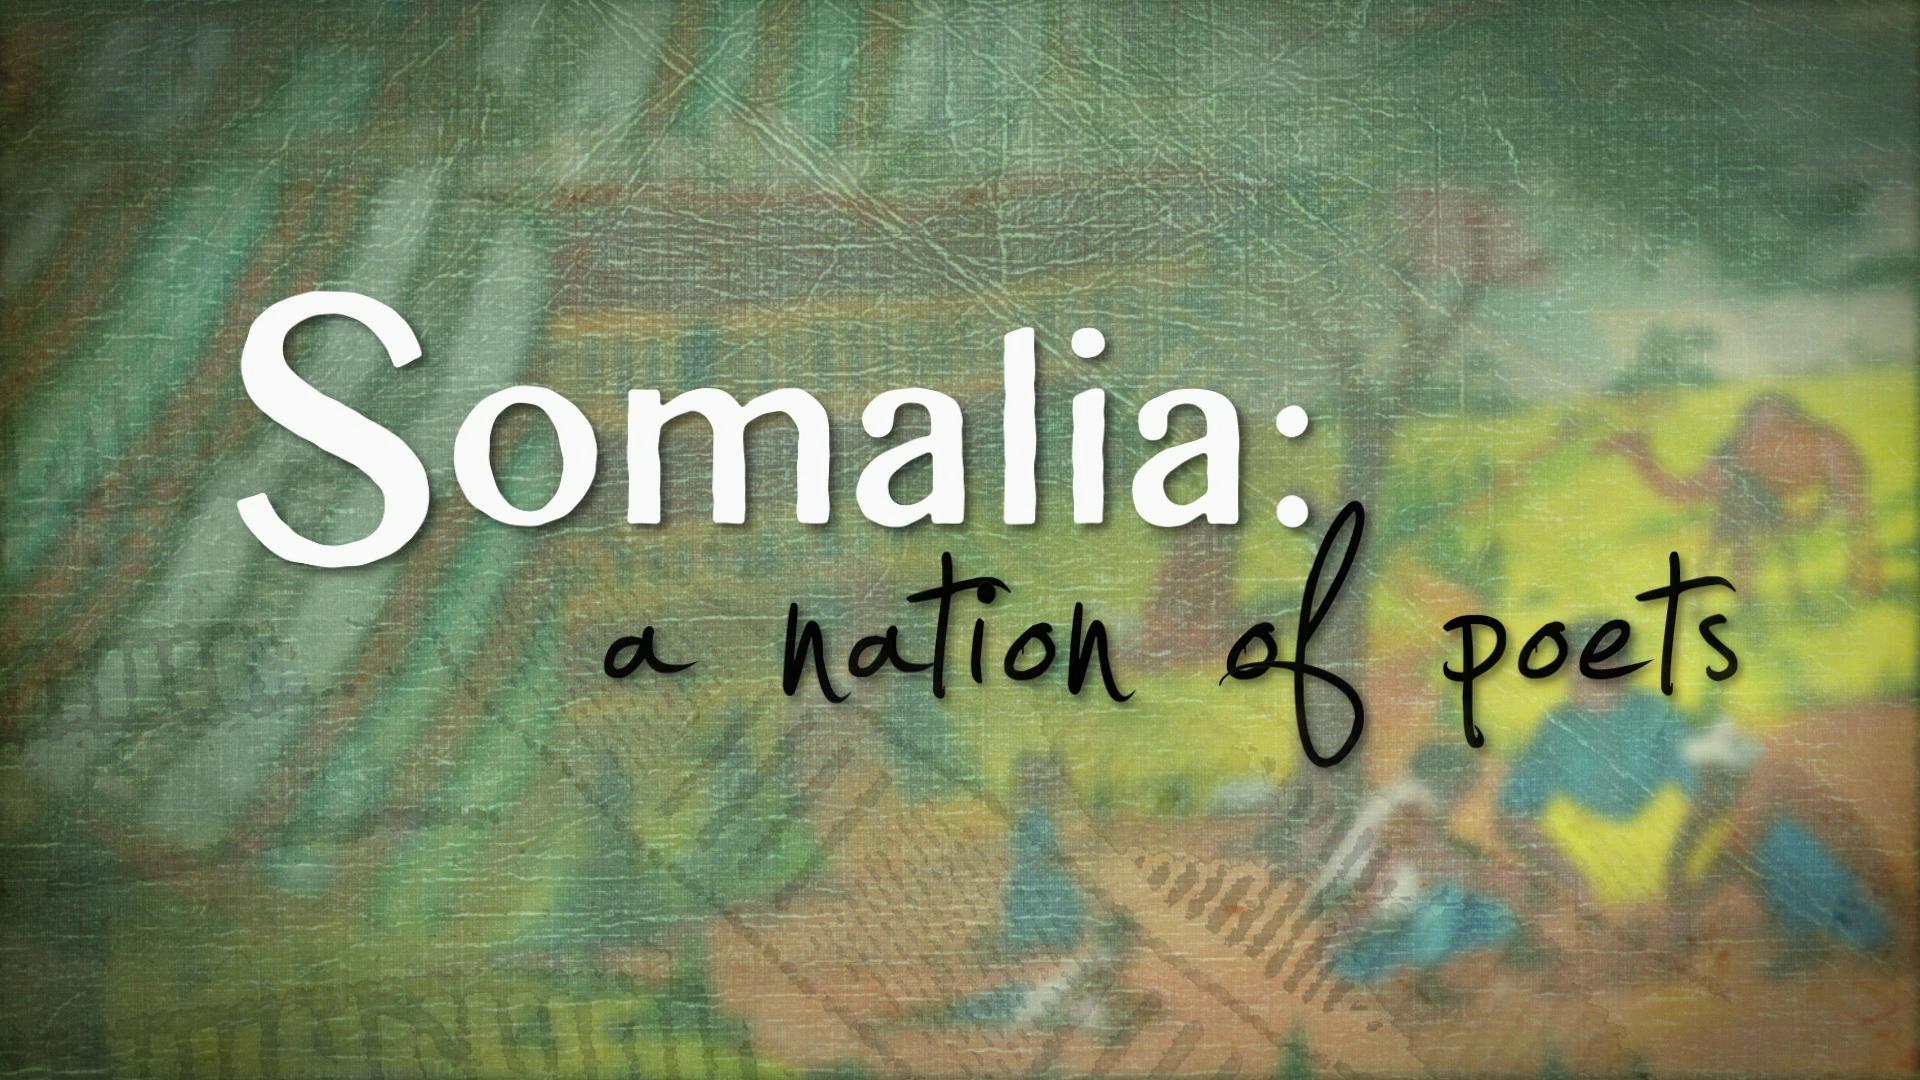 Somalia: A Nation of Poets